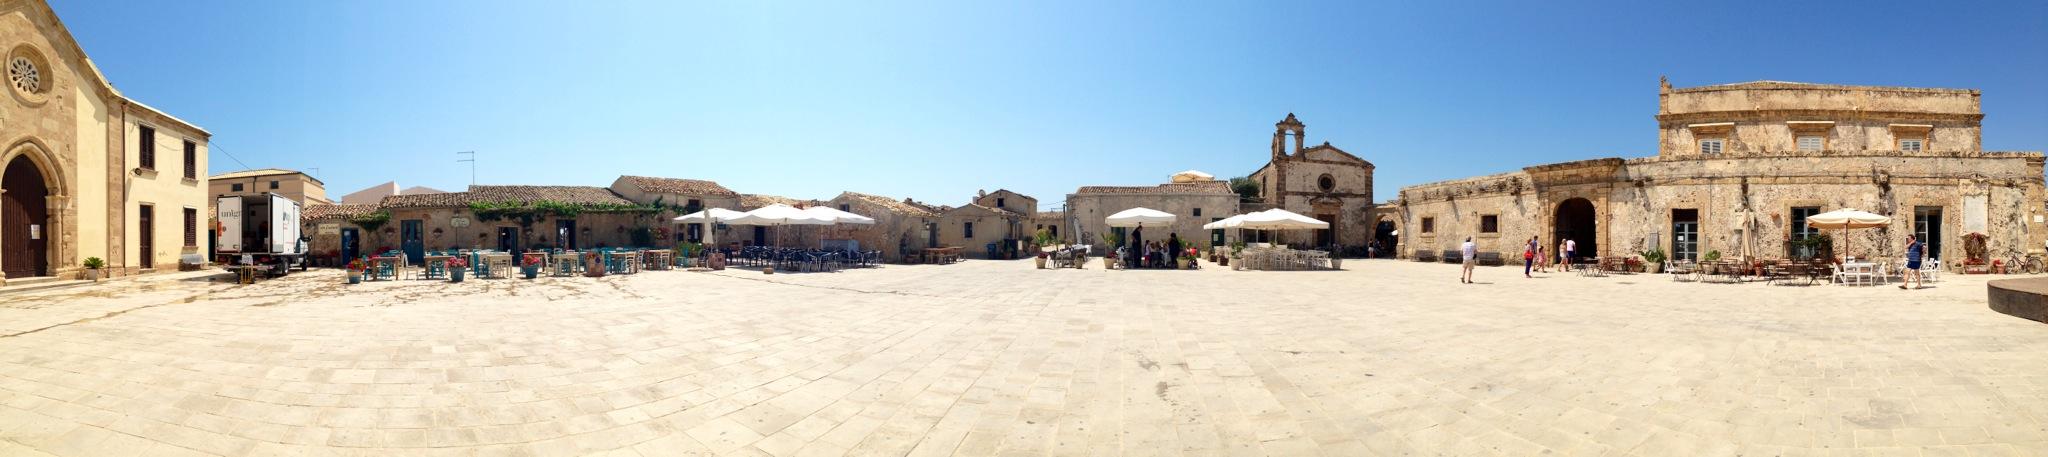 panoramica piazza regina margherita, marzamemi, sicilia